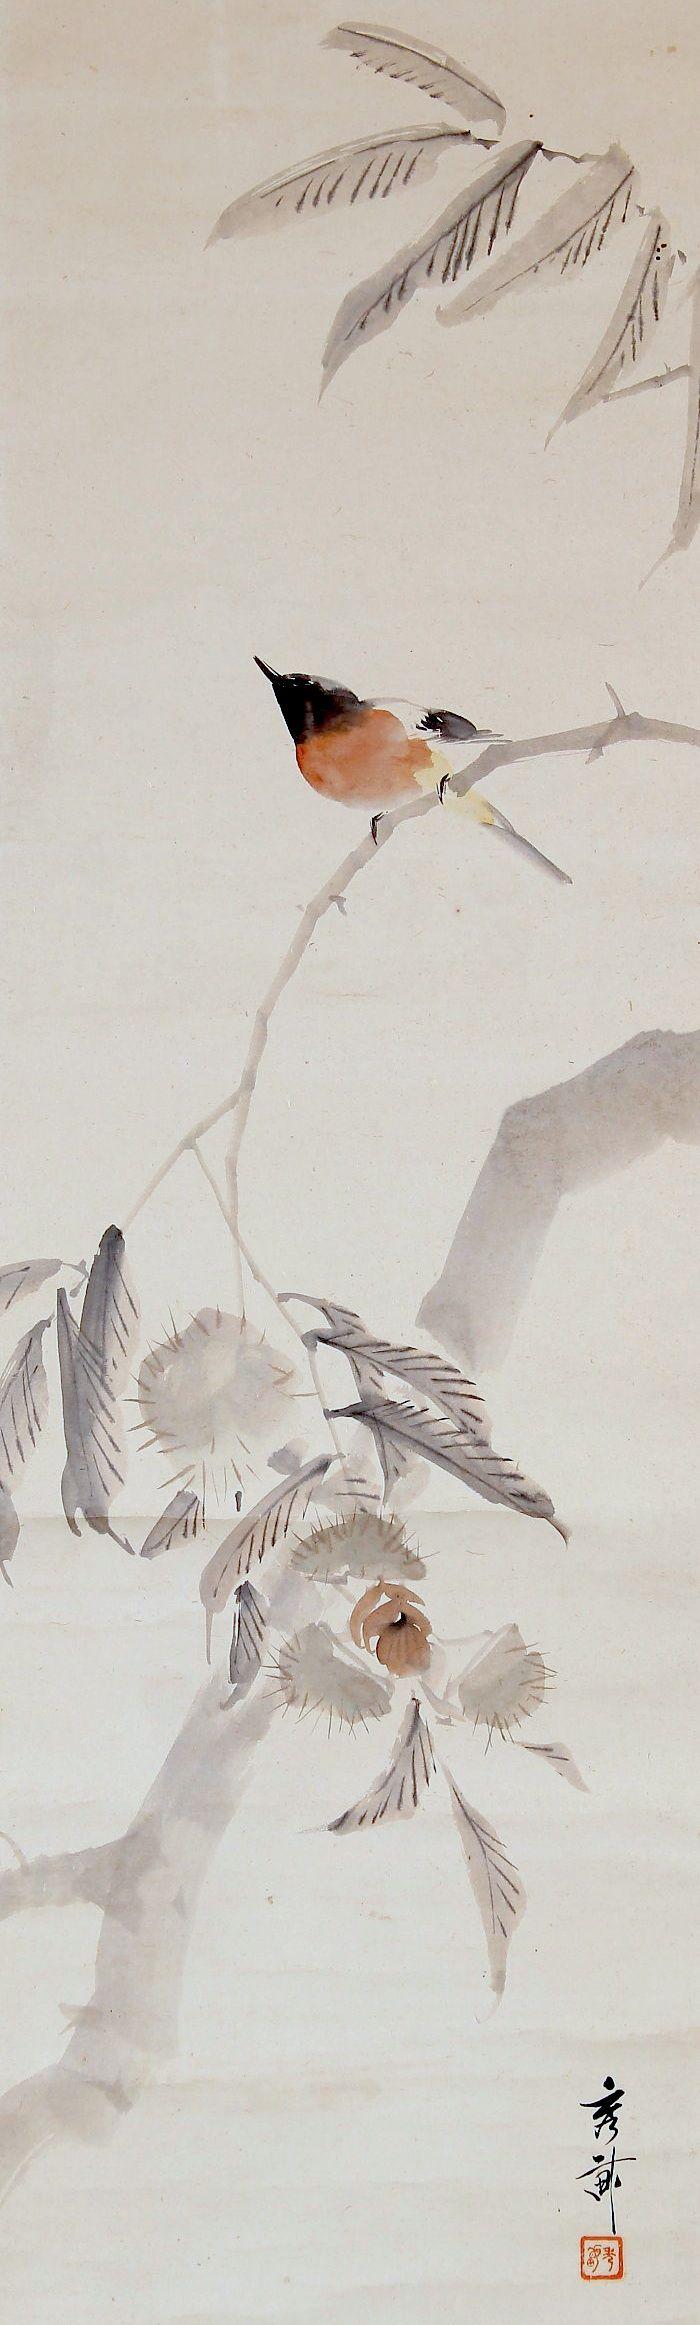 Ikegami Shuho 池上秀畝 (1874-1944), one of three kachoga scrolls, detail.